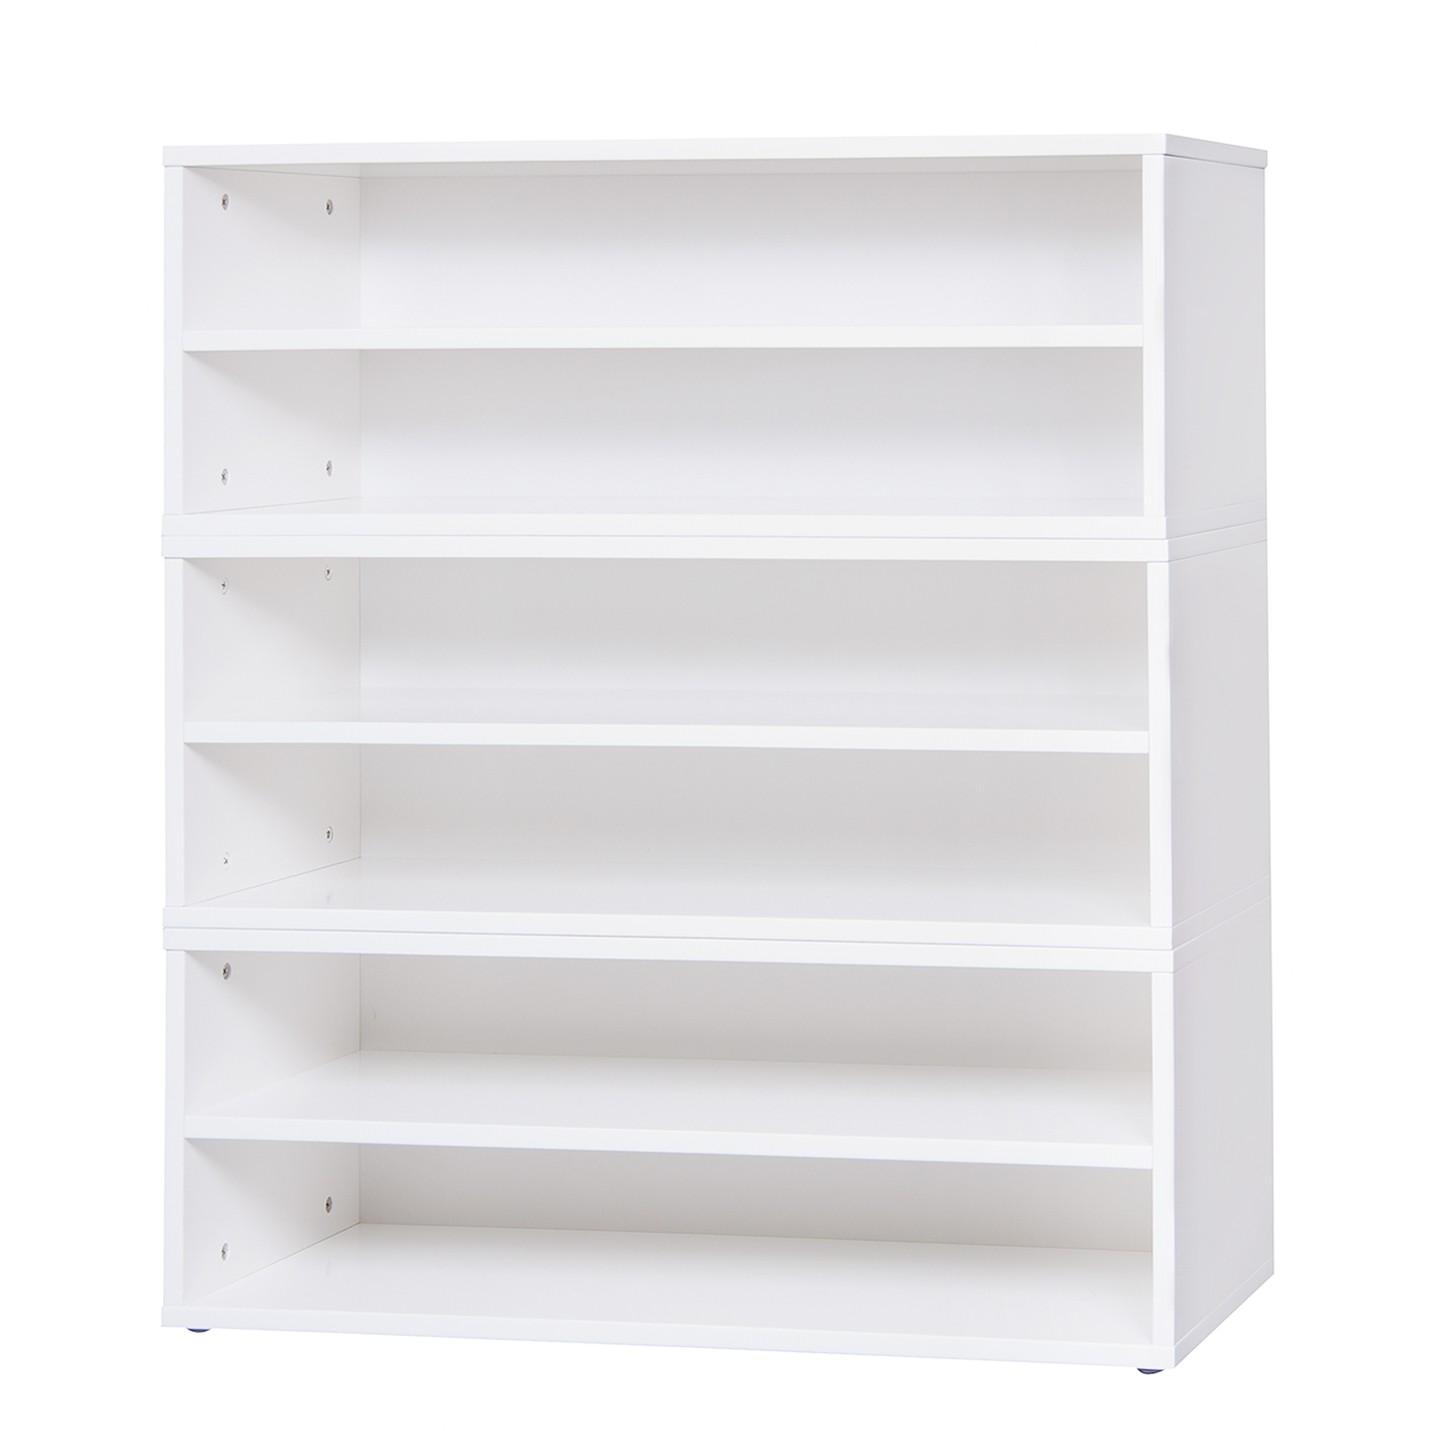 Schuhregalset BOX BASE III - Hochglanz Weiß